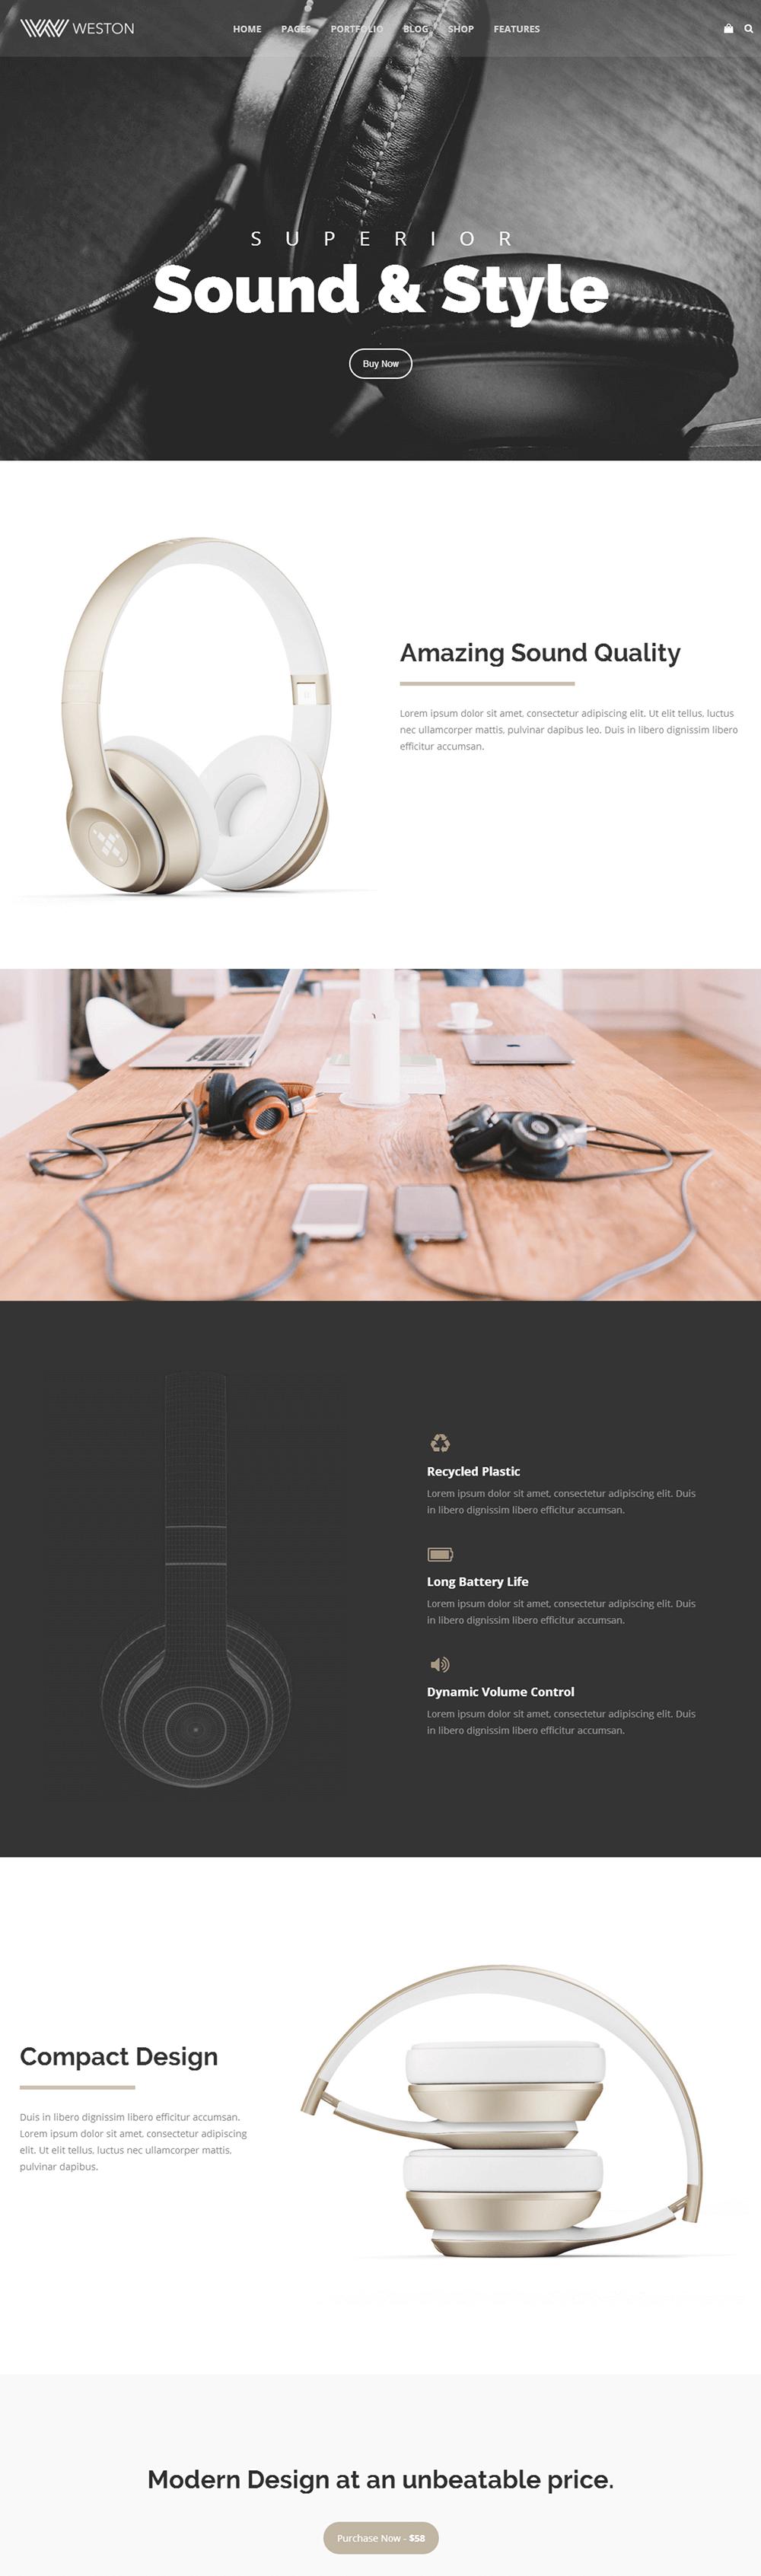 Weston - Product Landing Demo